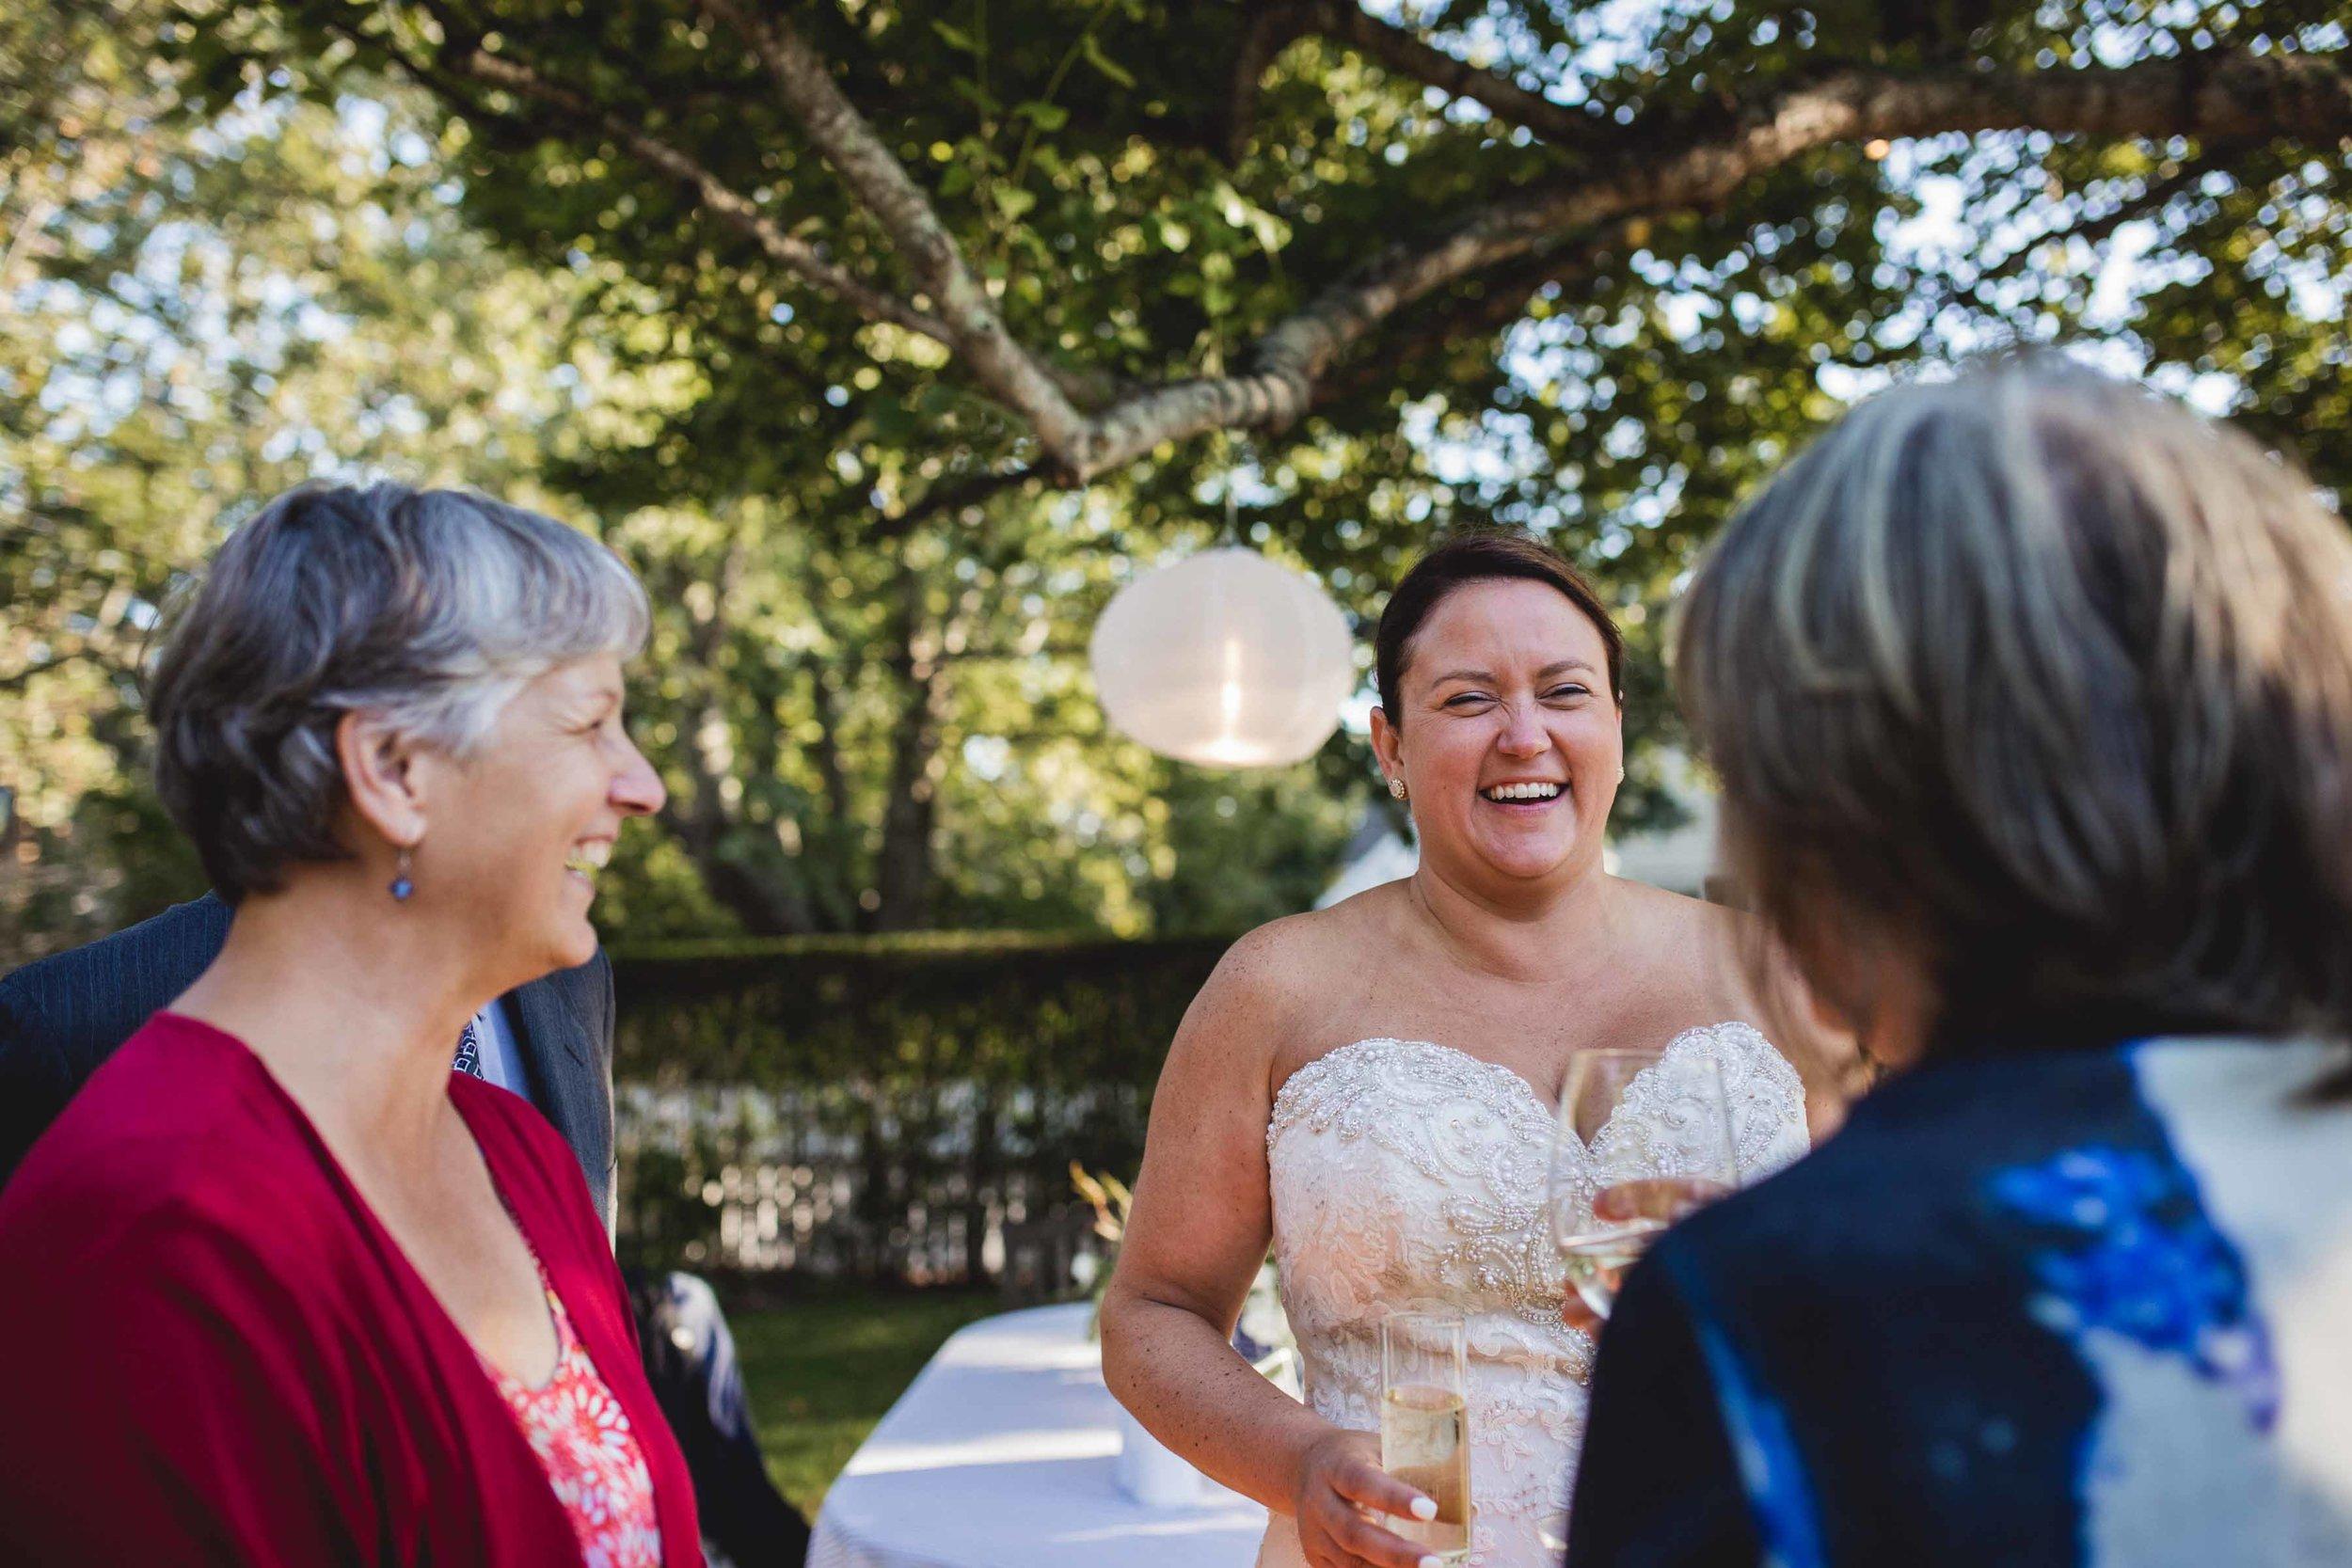 Marthas-vineyard-wedding-51.jpg